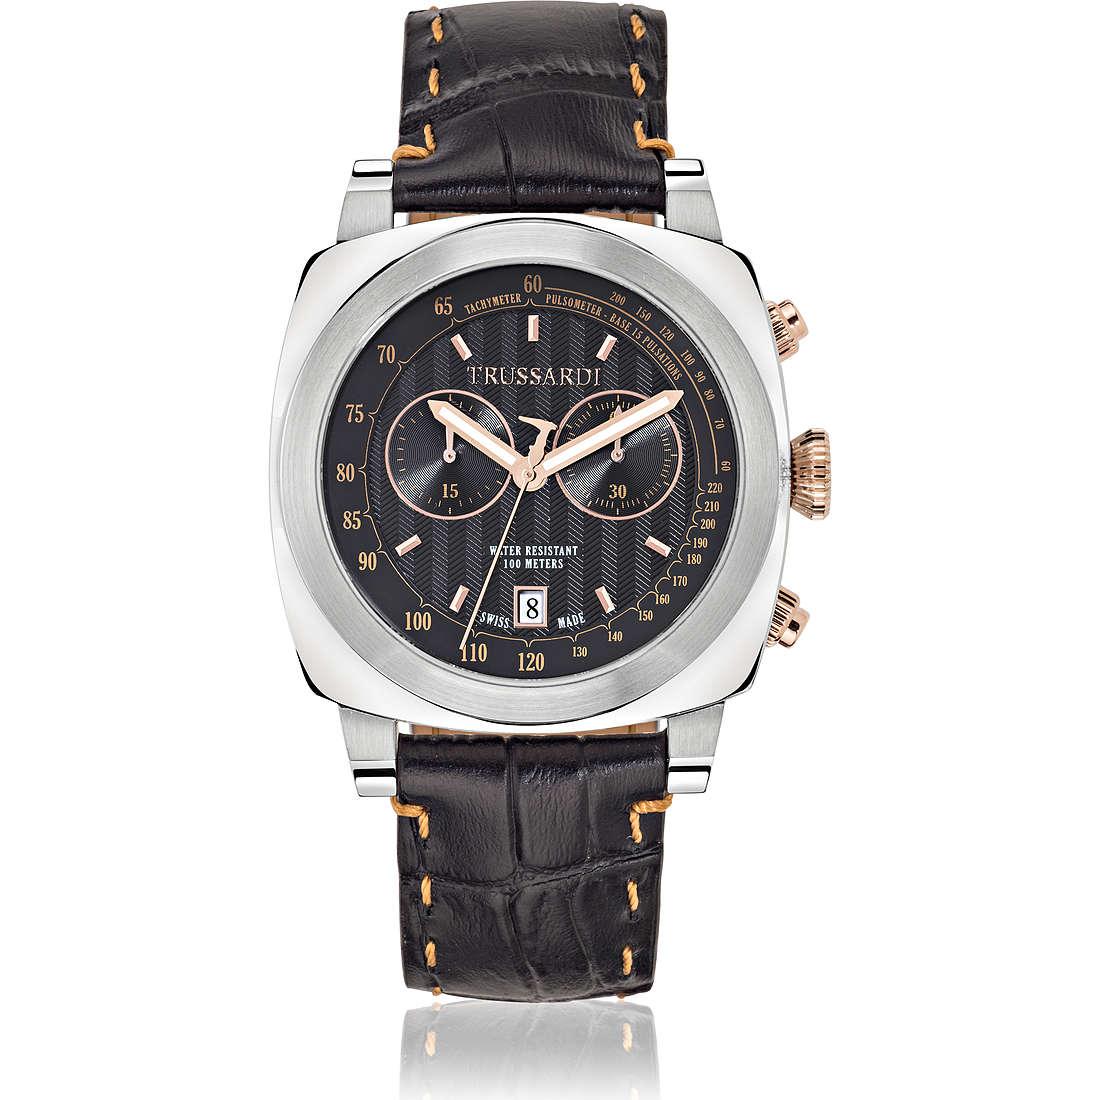 watch chronograph man Trussardi 1911 R2471602001